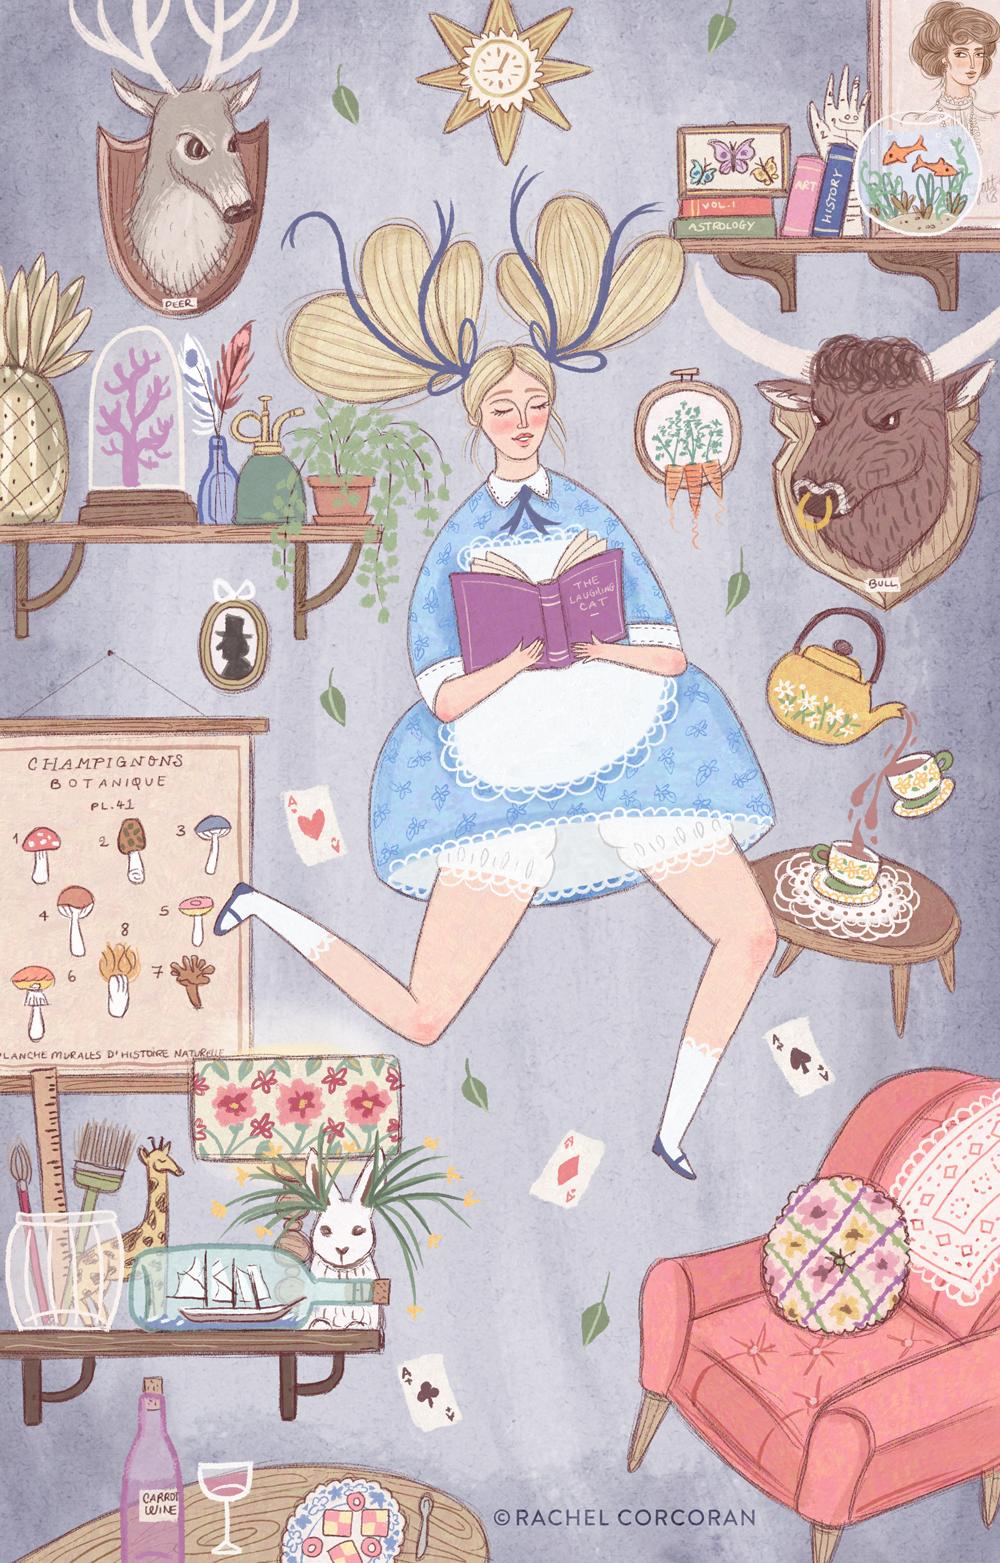 Alice in Wonderland illustration by Rachel Corcoran